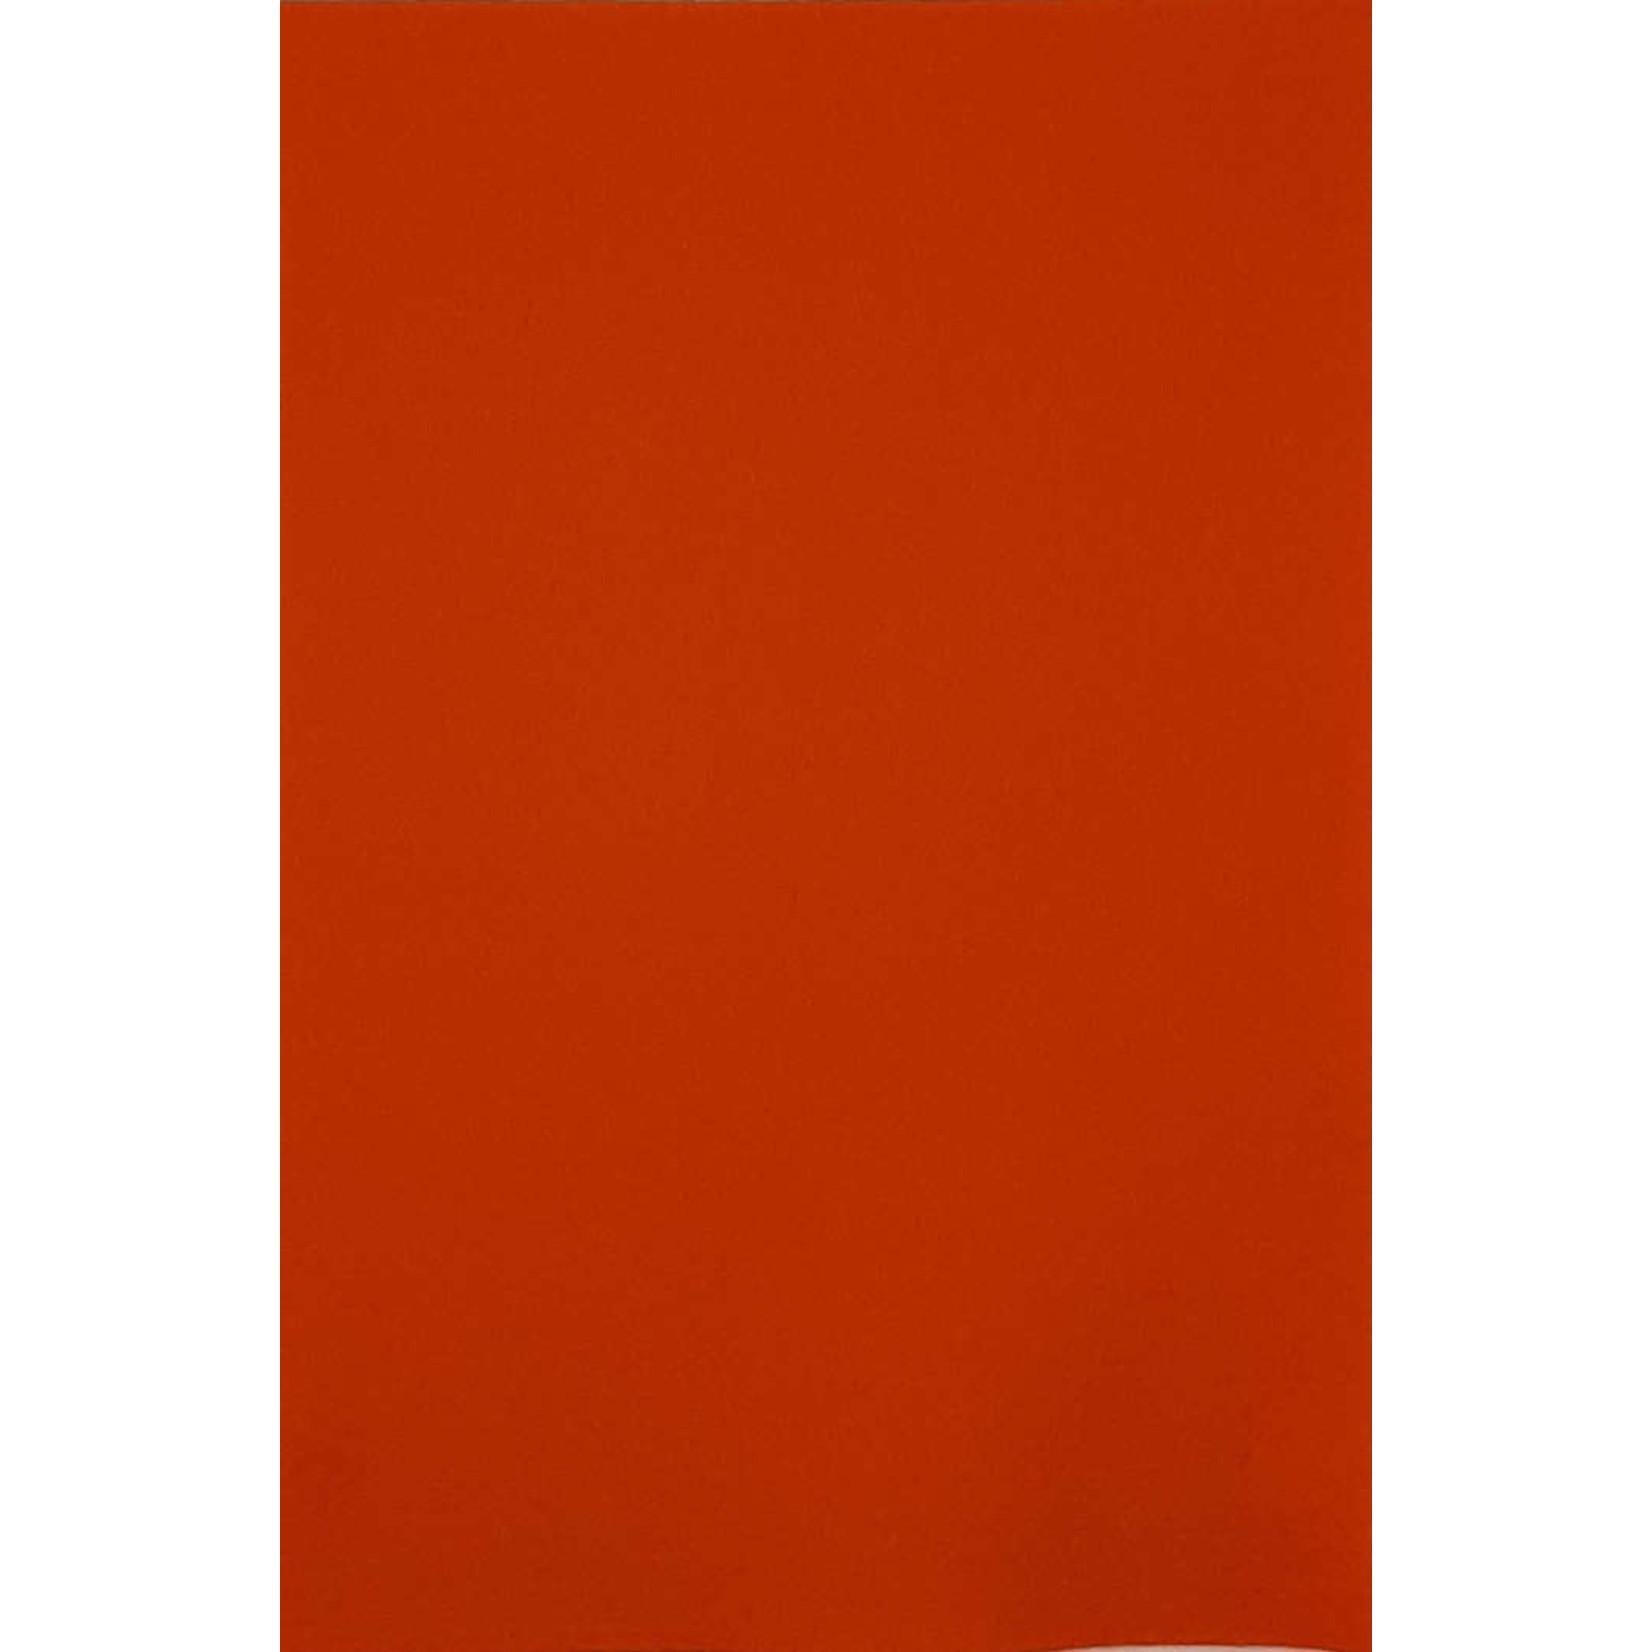 HollandFelt Wolvilt - lapje 20 x 30 cm. - kleur 05  Oranje - zuiver scheerwol- 1 mm. dik